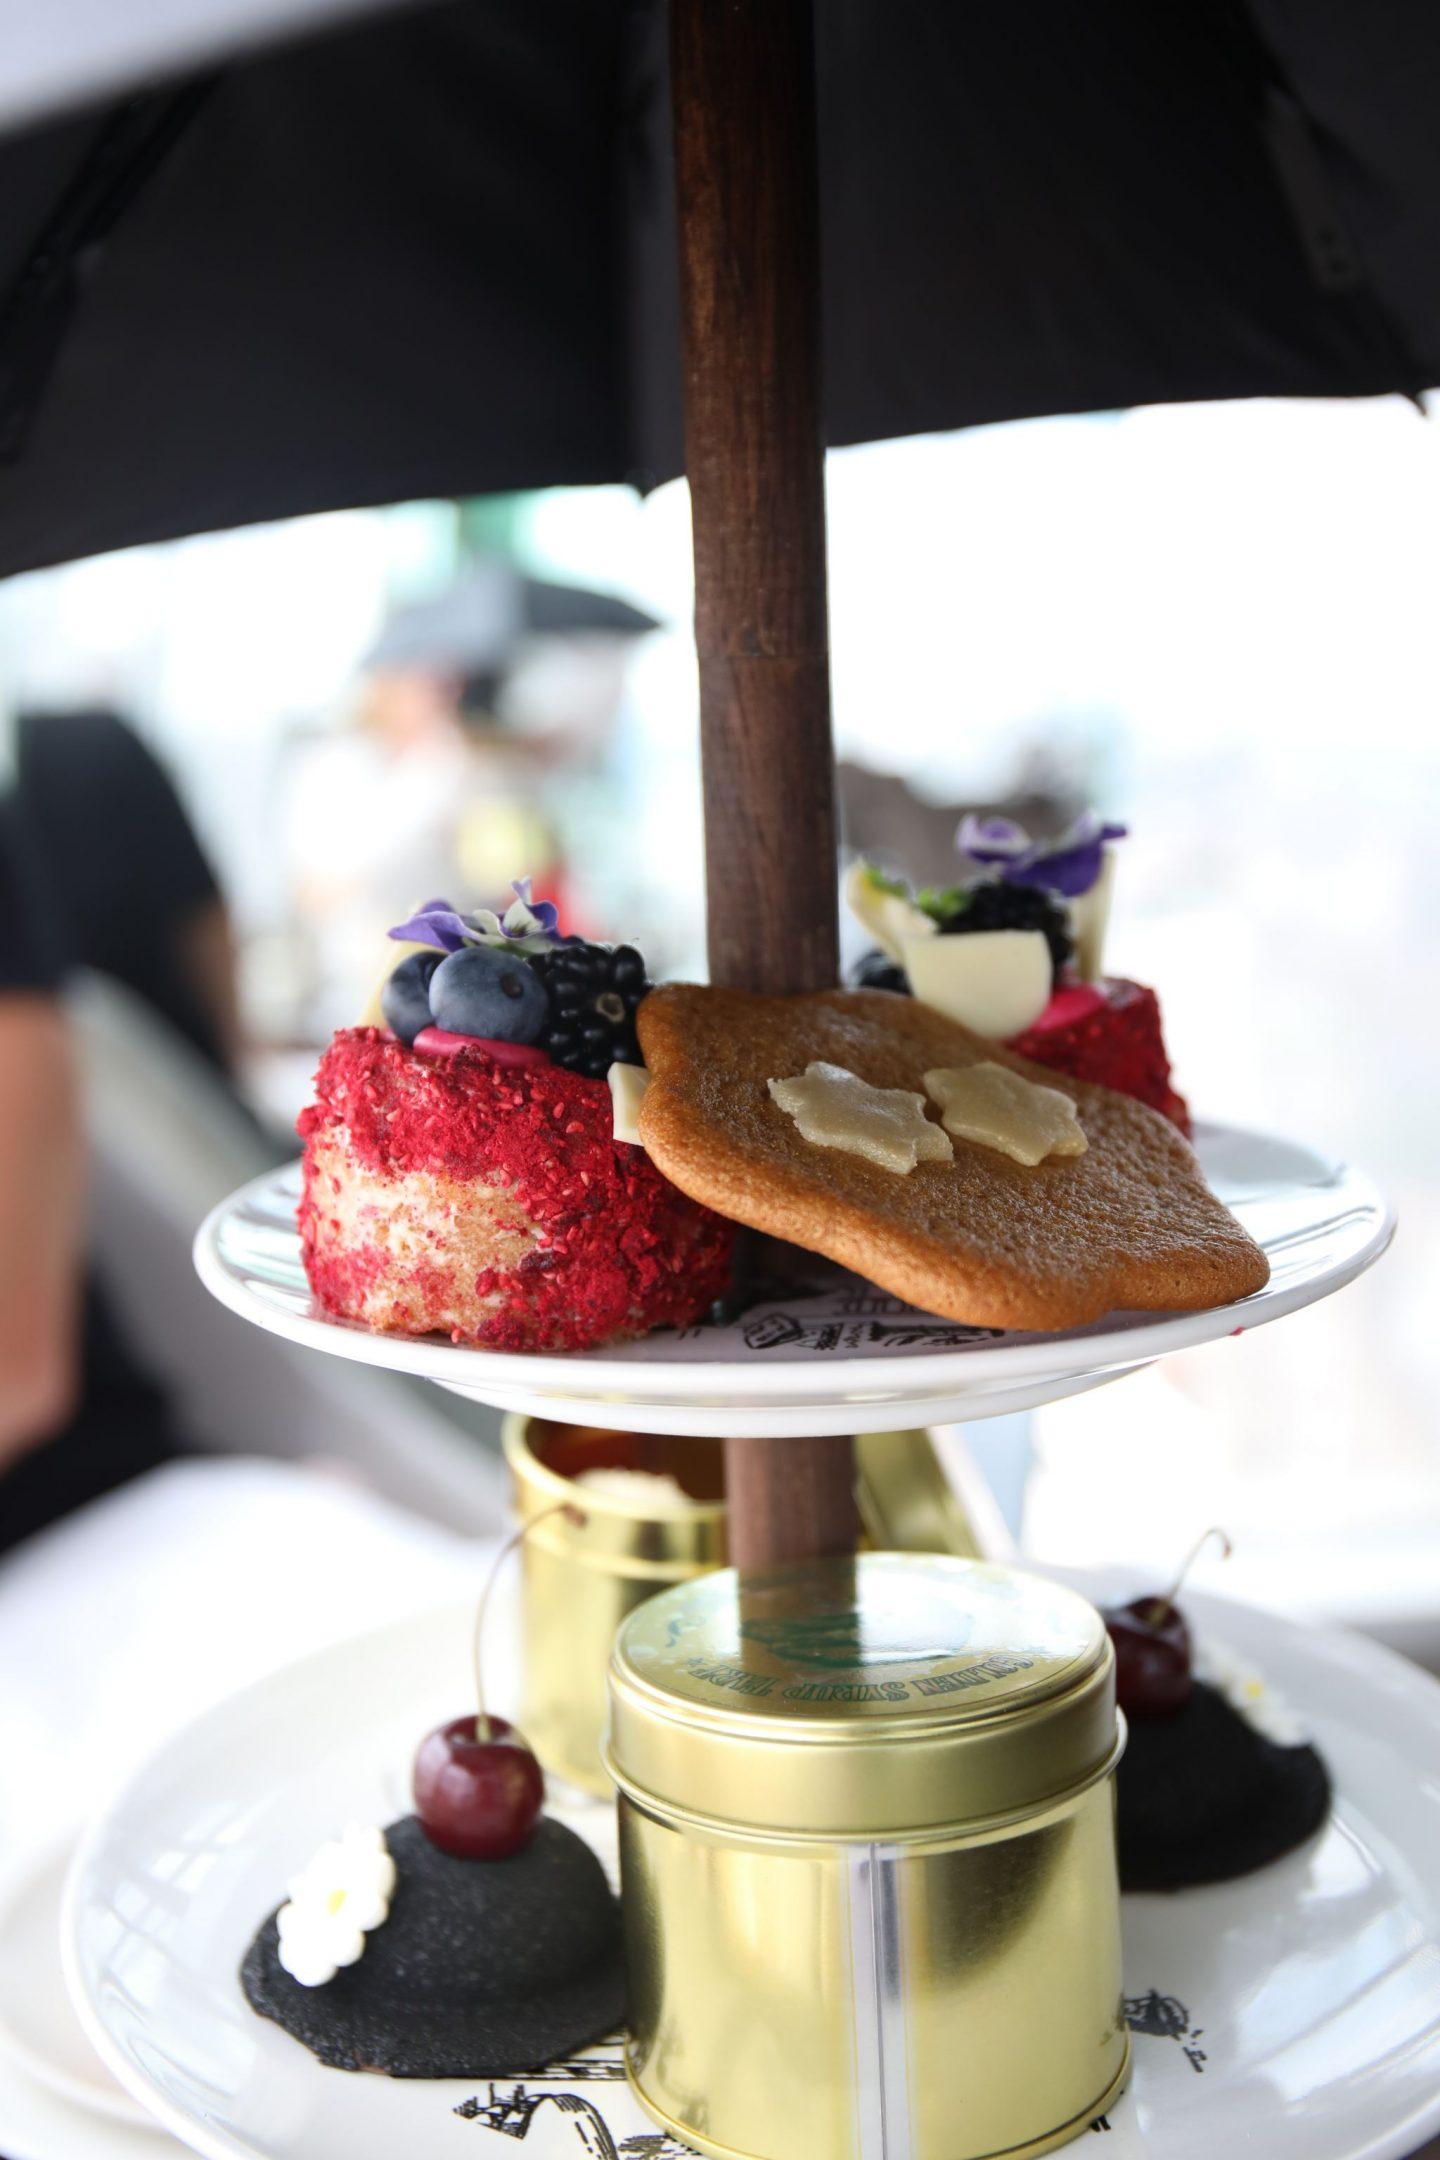 Mary Poppins Afternoon Tea At Aqua Shard Kalanchoe